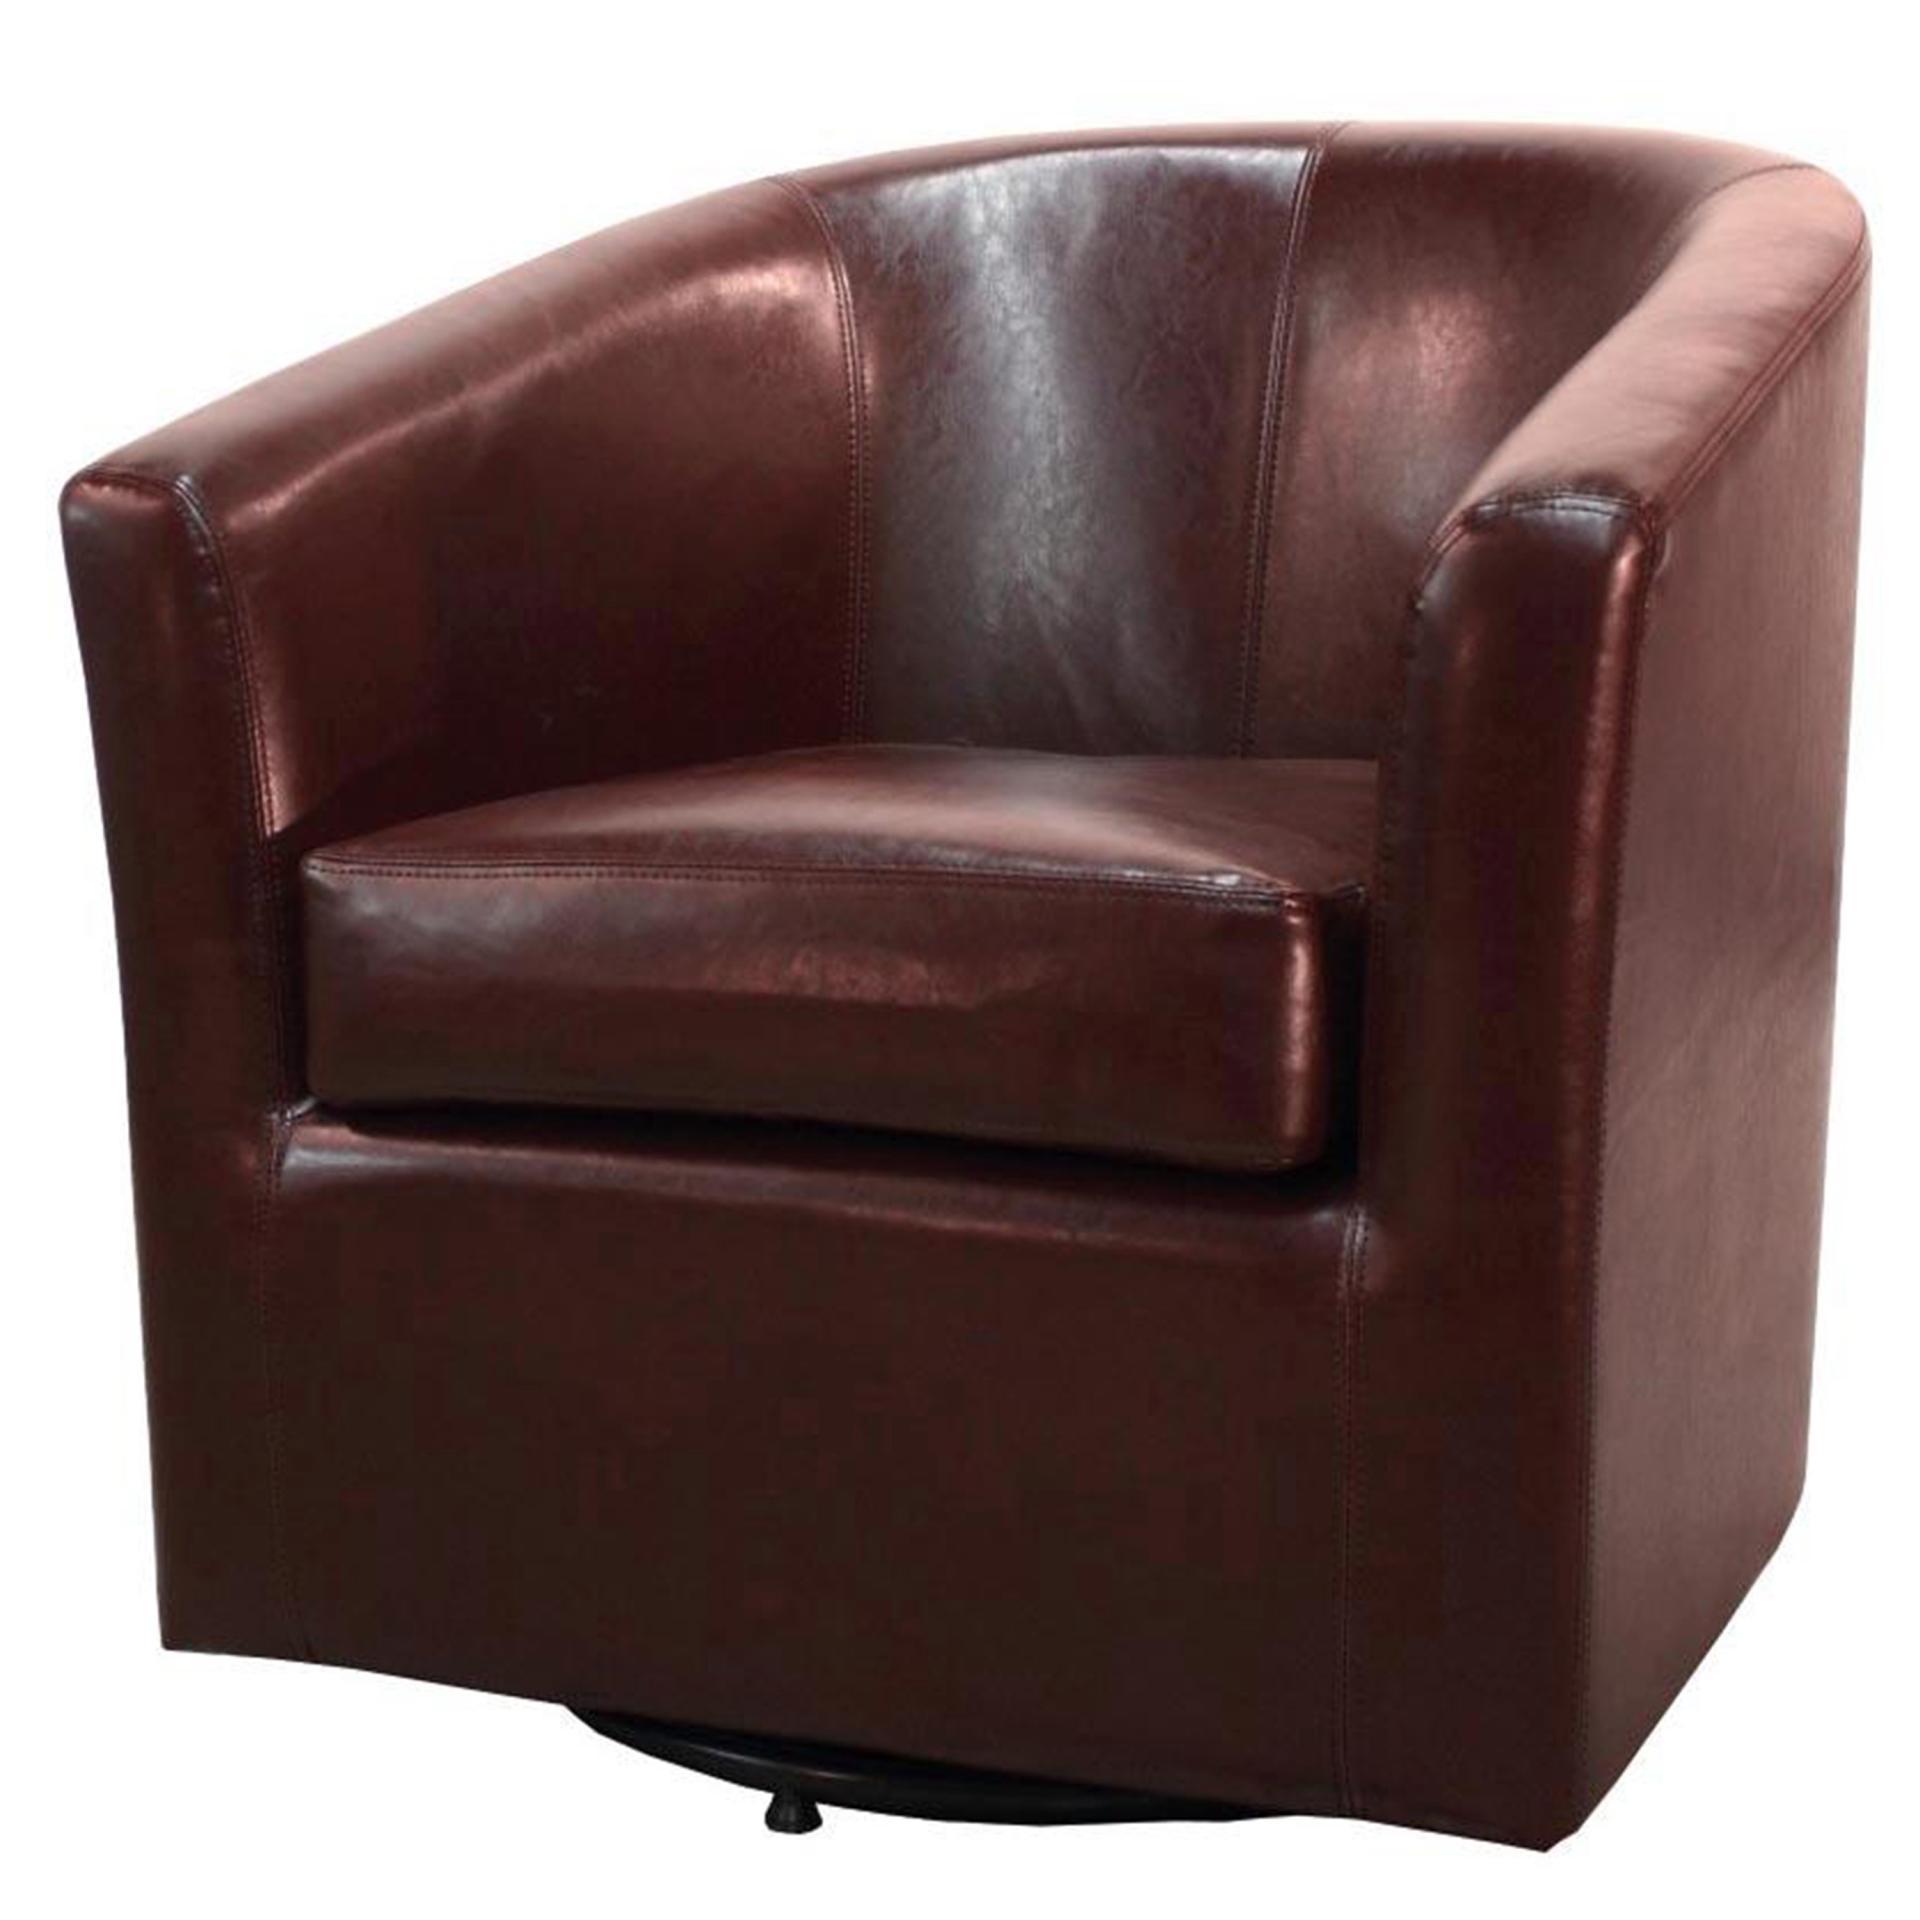 193012b 208 Npd Home Furniture Wholesale Lifestyle